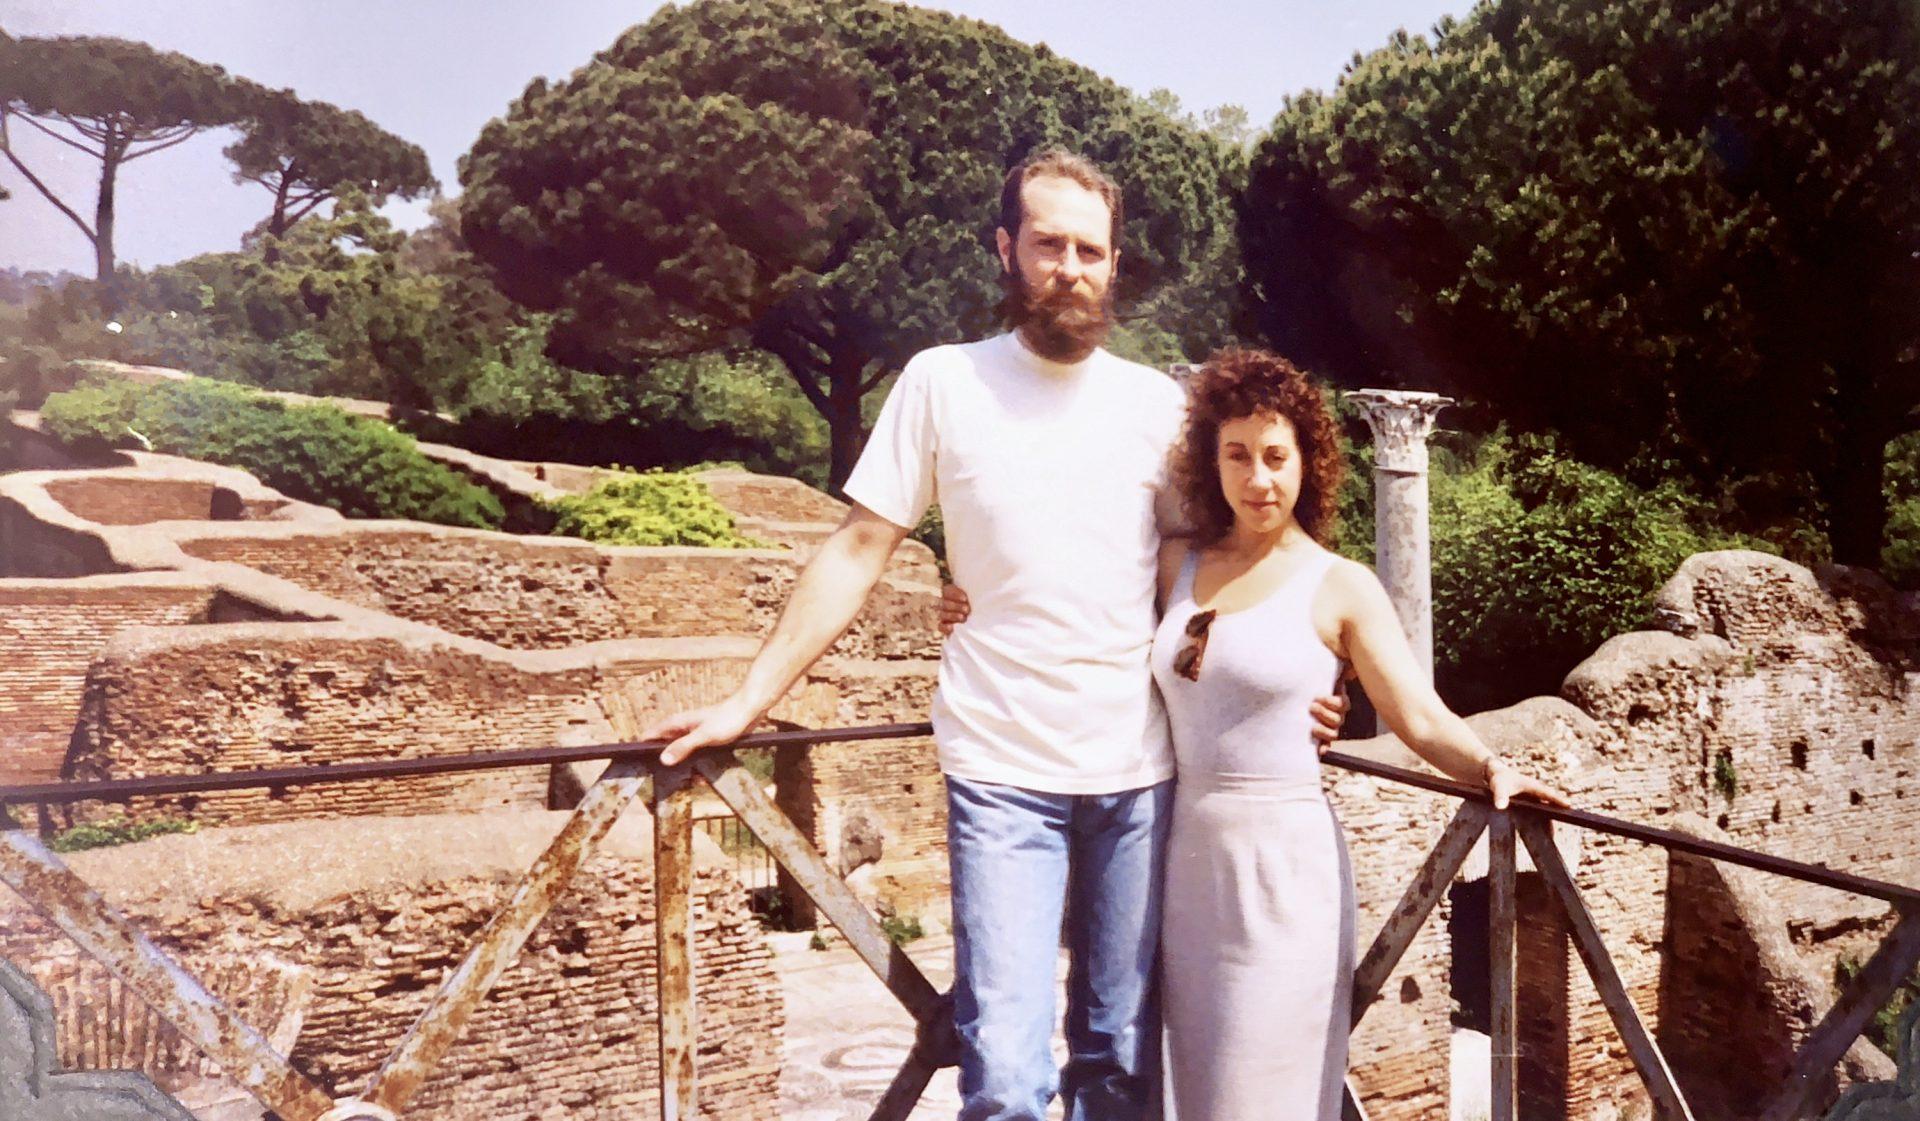 On our honeymoon